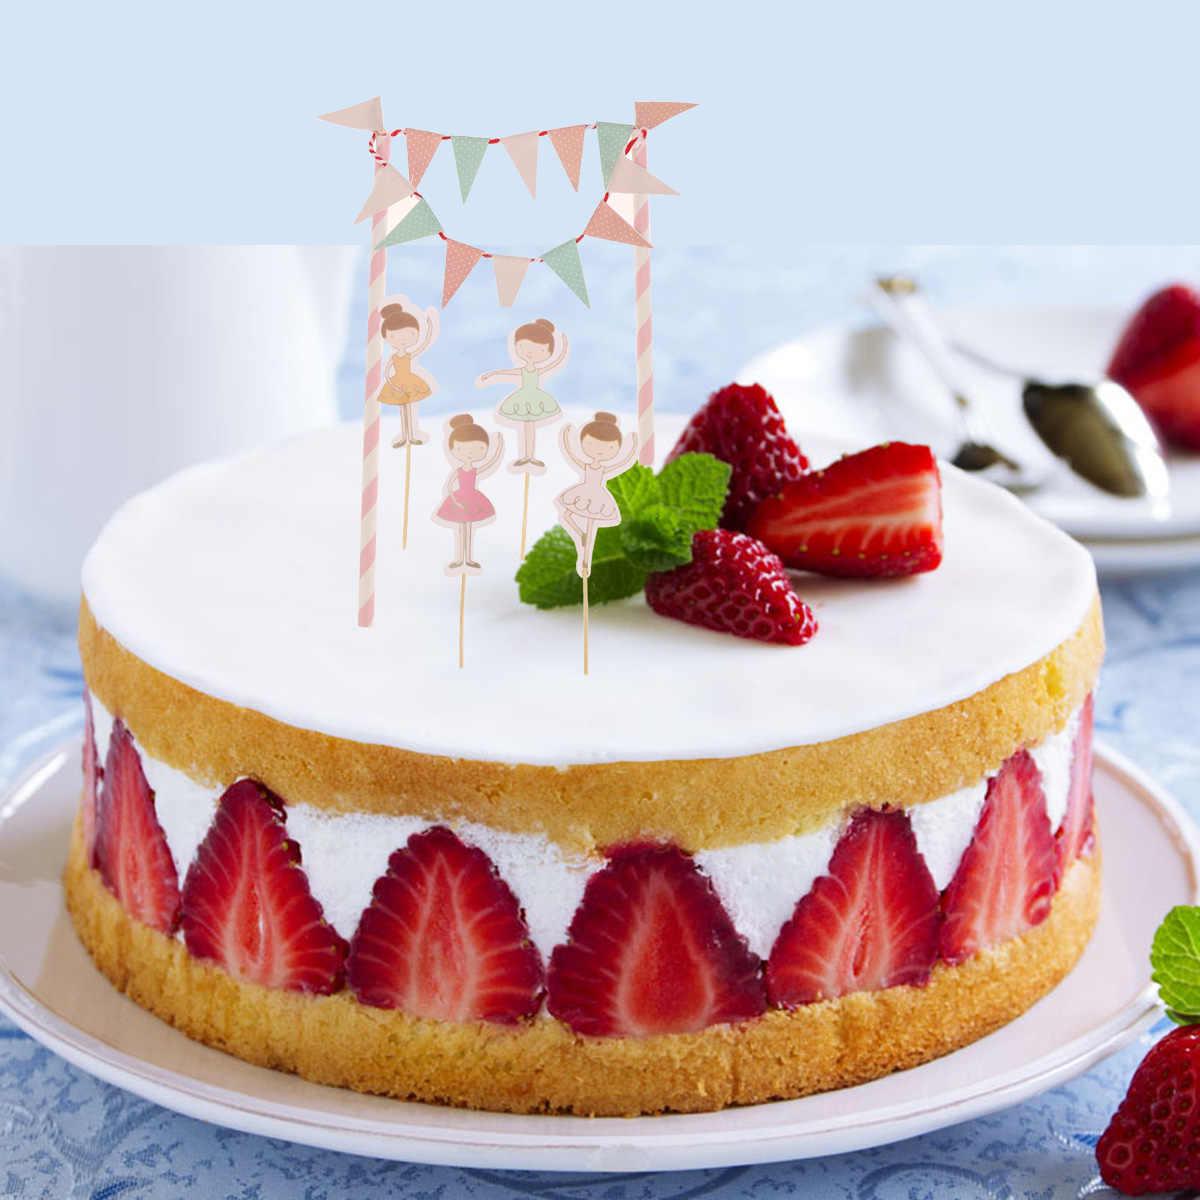 Superb Ballet Dancer Birthday Cake Bunting Flag Topper Ballerina Personalised Birthday Cards Paralily Jamesorg